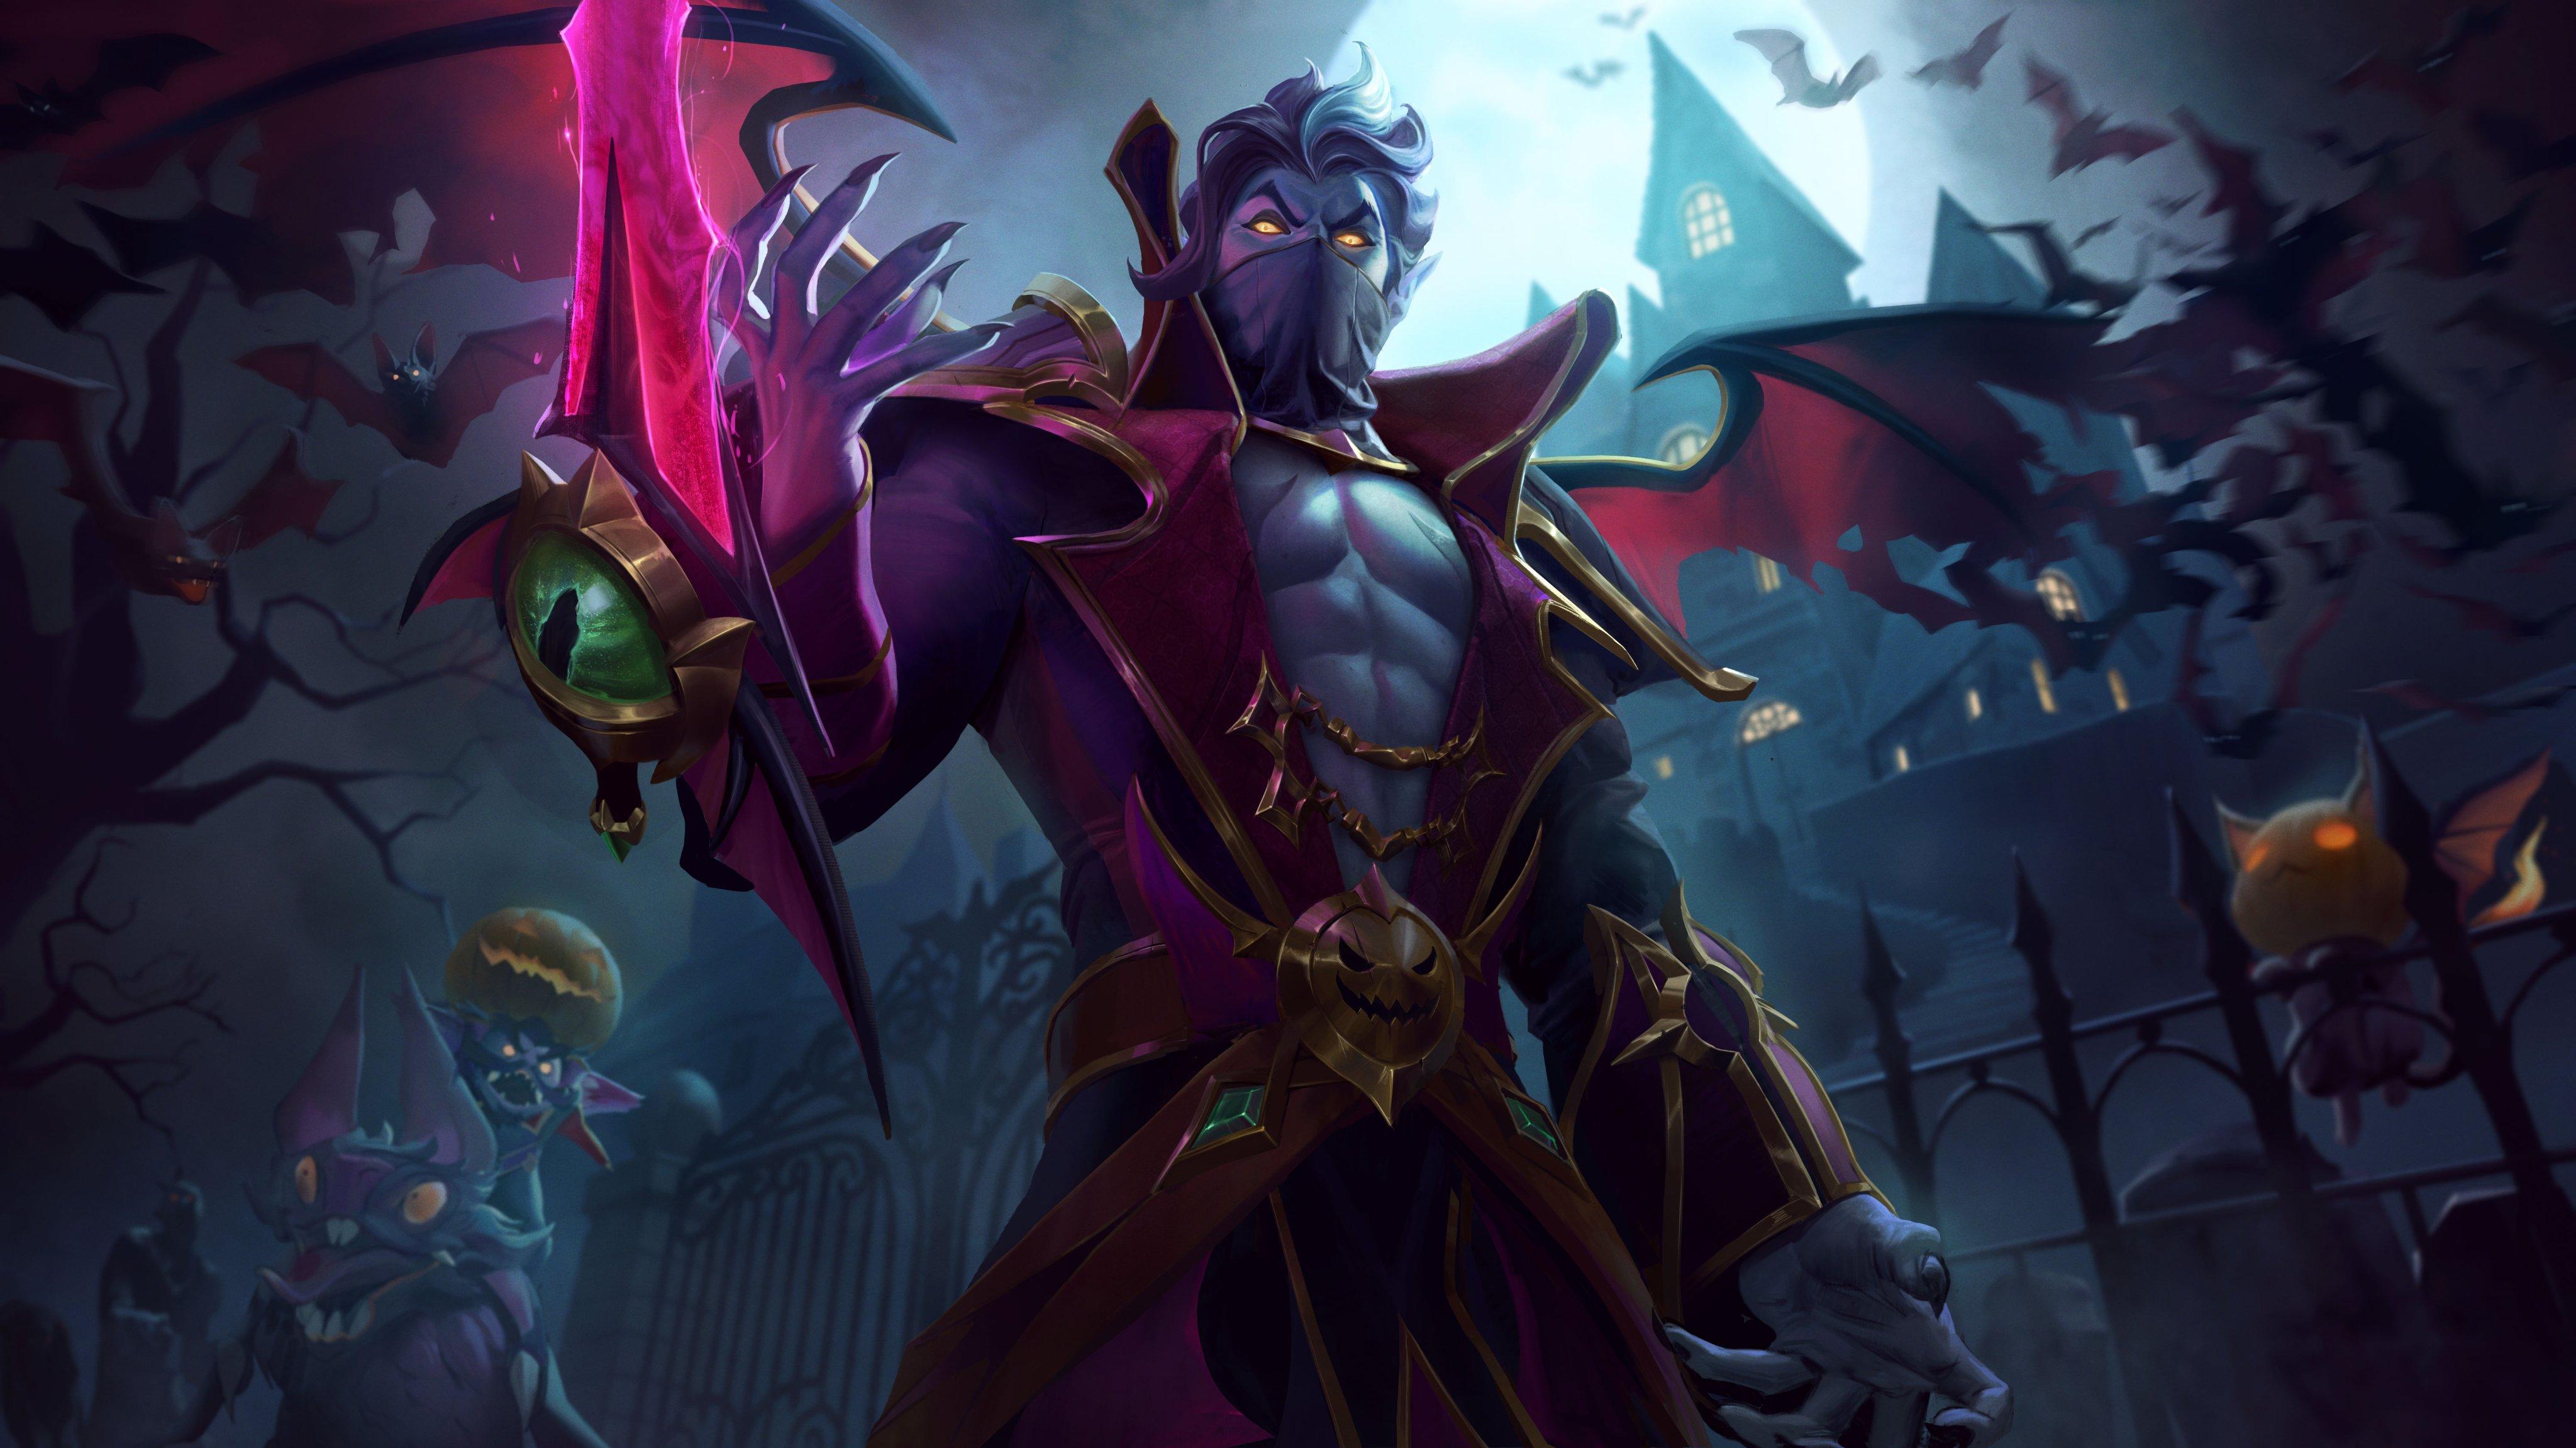 General 4096x2303 Kassadin League of Legends Riot Games Halloween vampire (anime) dark Jack O' Lantern